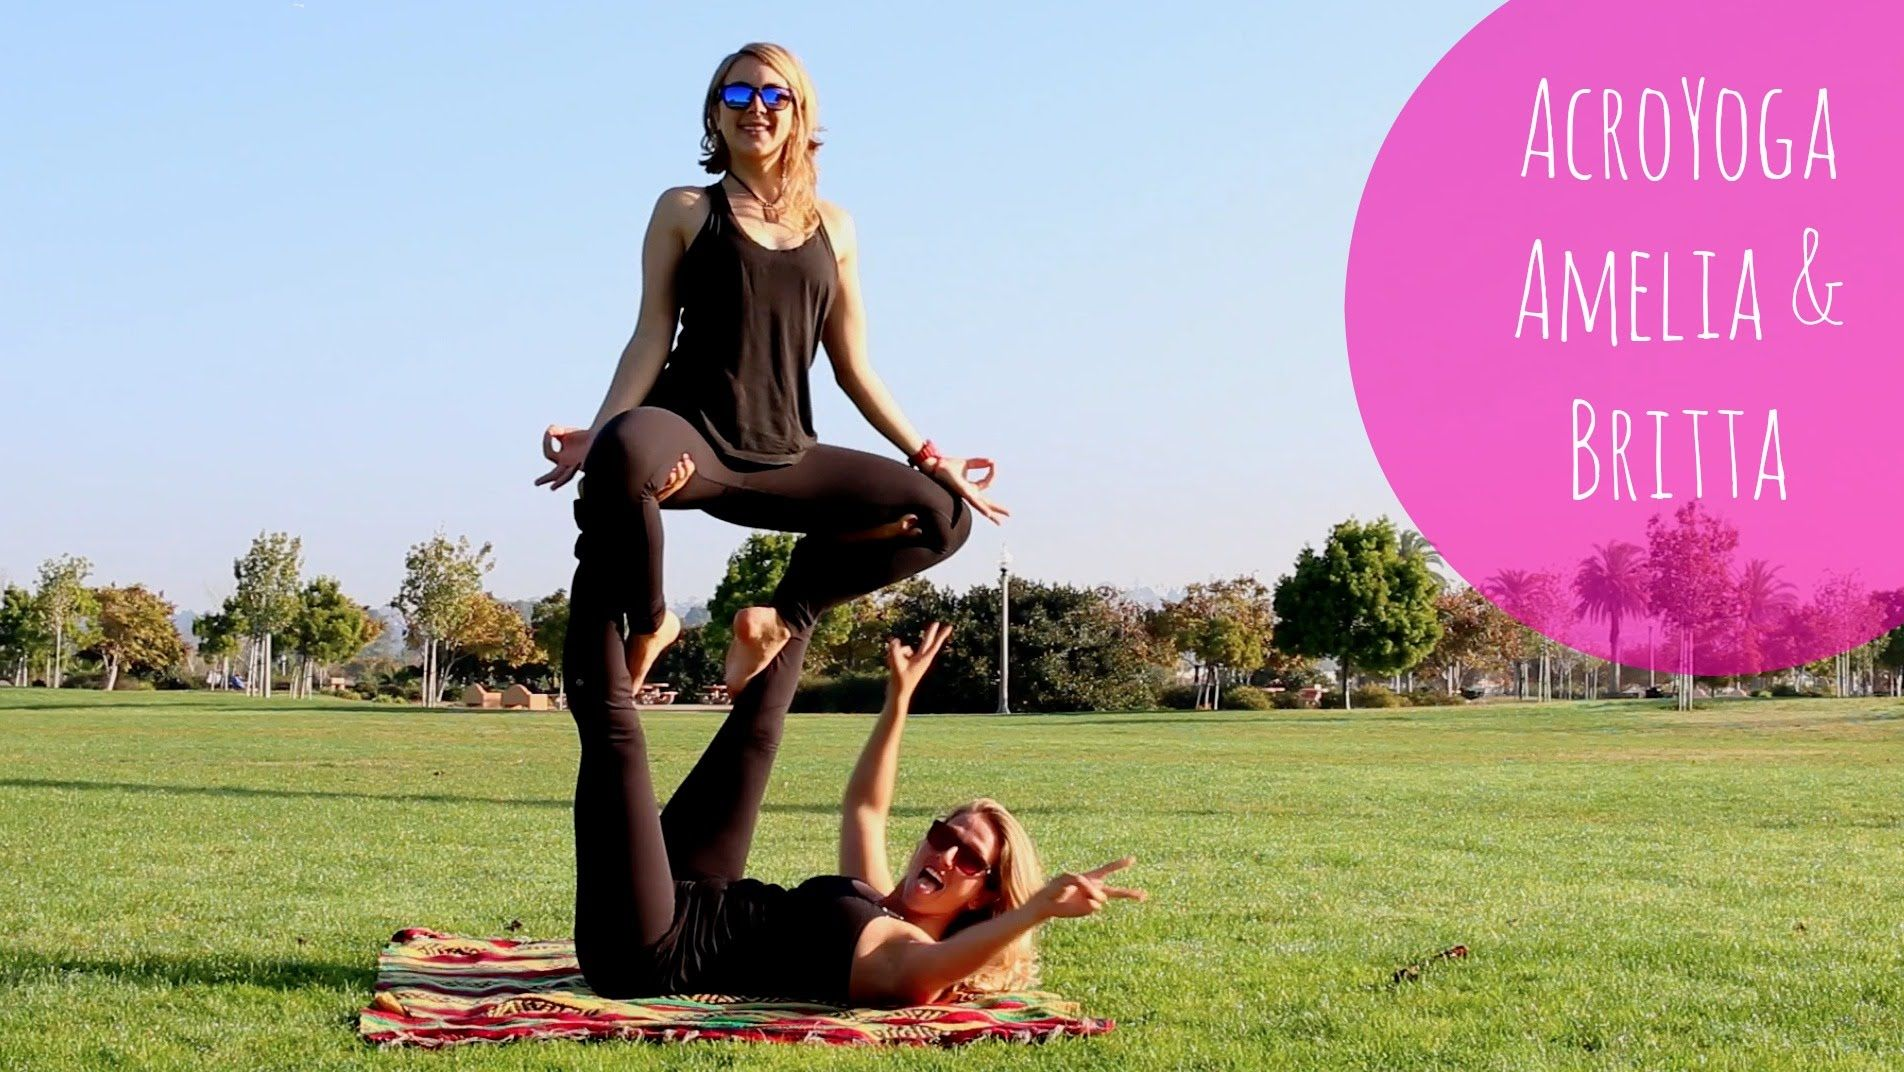 I love the @stokedyogi!! This video is so cute!  AcroYoga | Stoked Yogi | Amelia & Britta